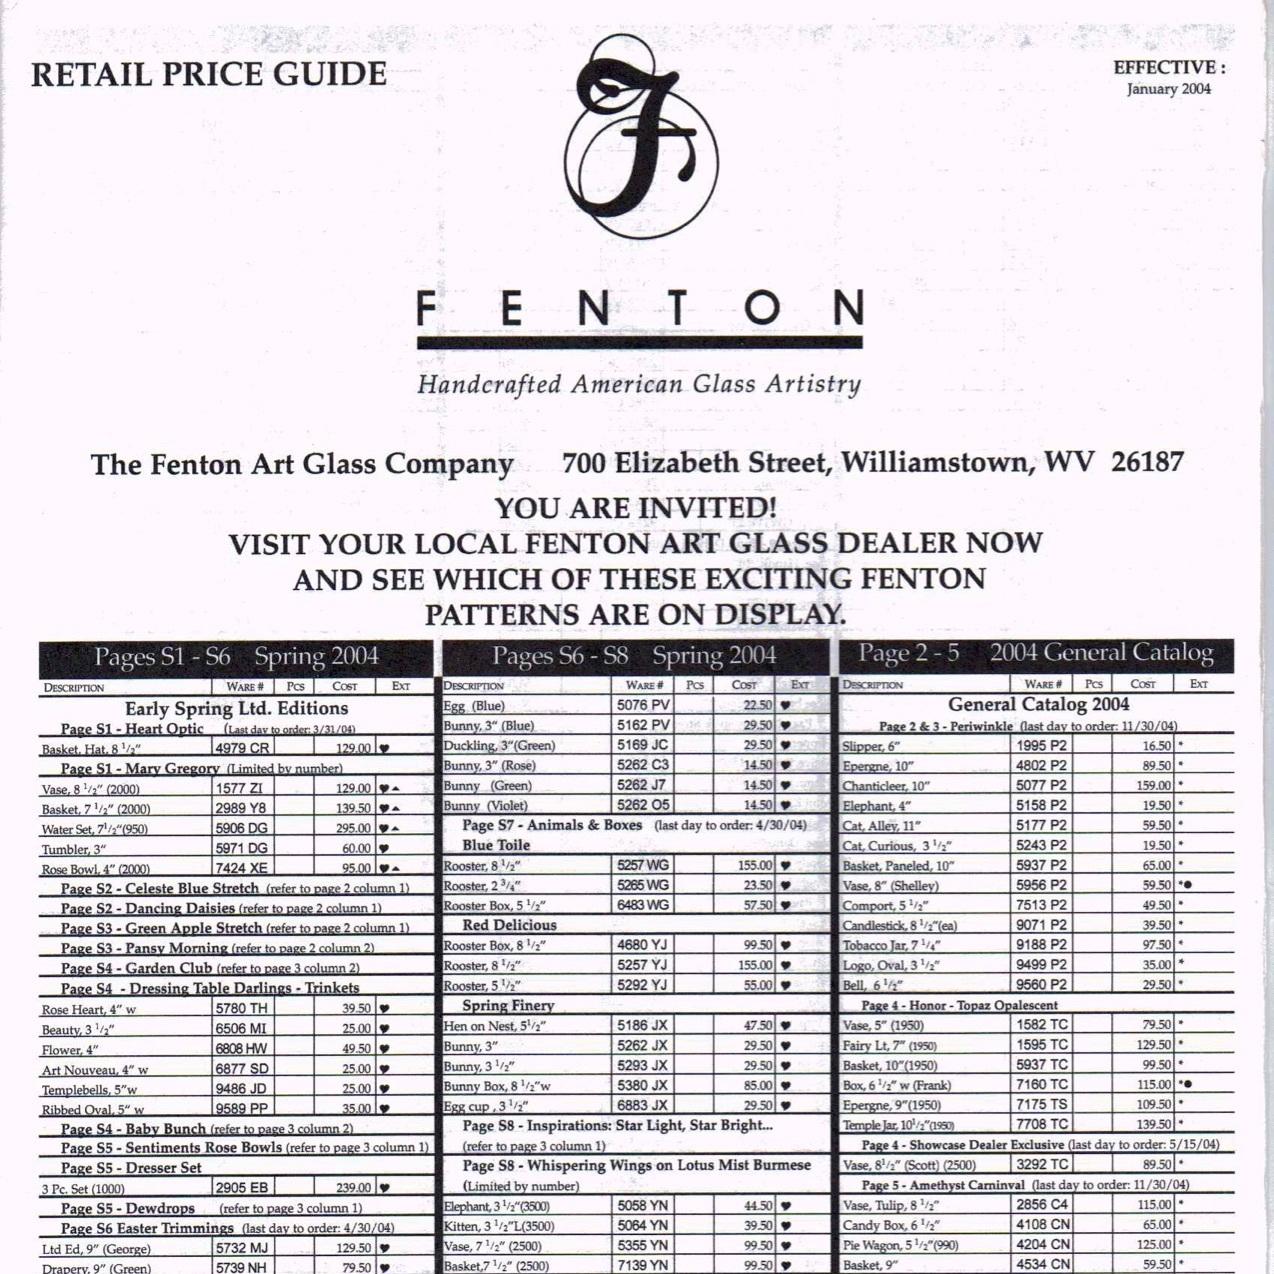 2004 Jan Price Guide